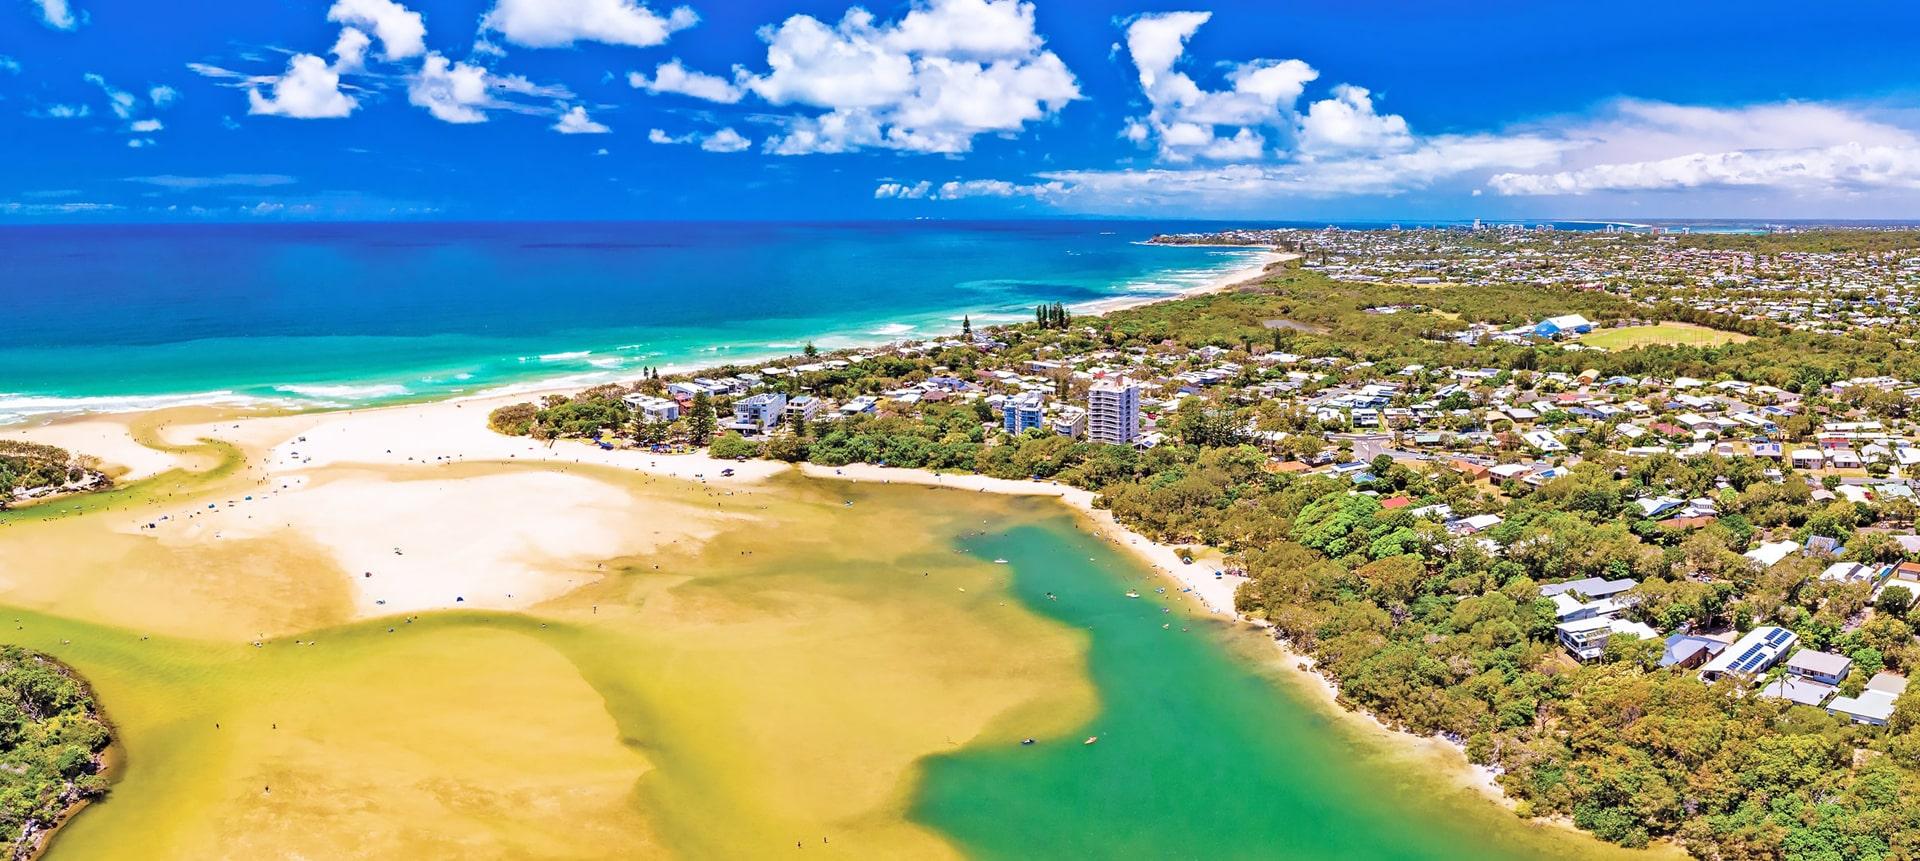 Cursos de inglés en Sunshine Coast